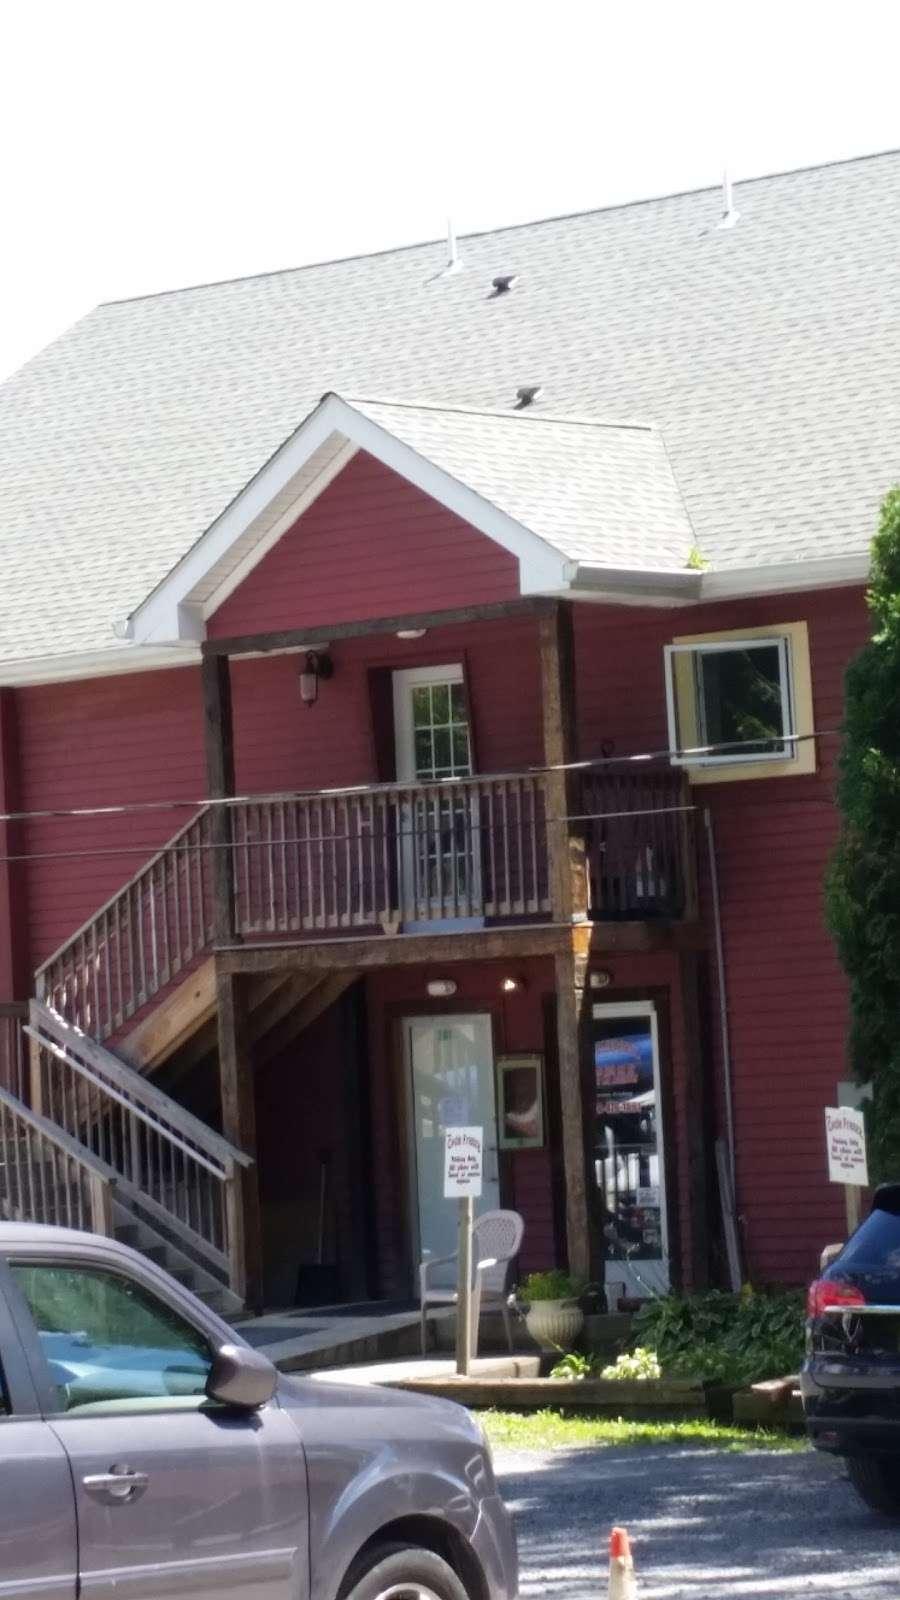 Chamberlain Canoes - travel agency  | Photo 8 of 10 | Address: 103 Five Star Ln, East Stroudsburg, PA 18301, USA | Phone: (570) 421-0180